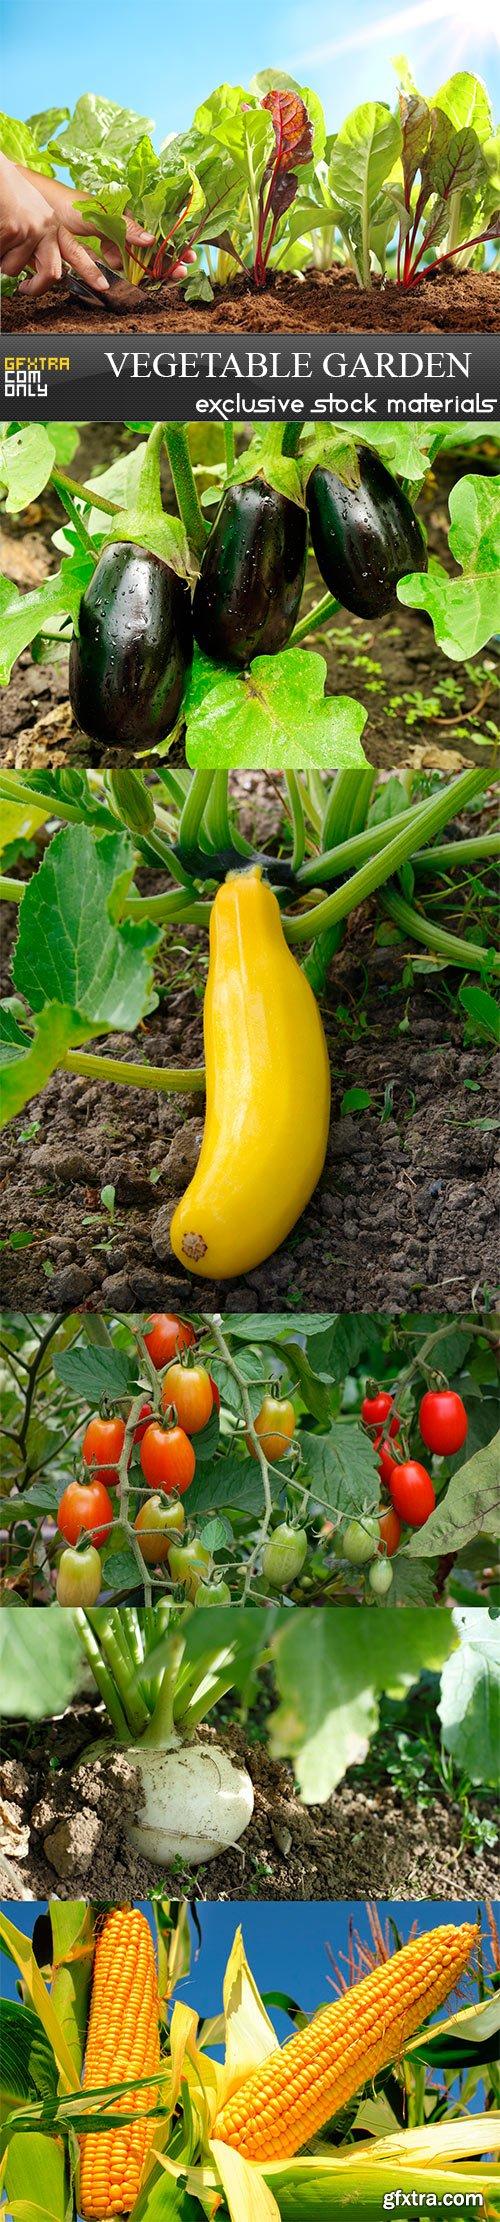 Vegetable garden - 6UHQ JPEG